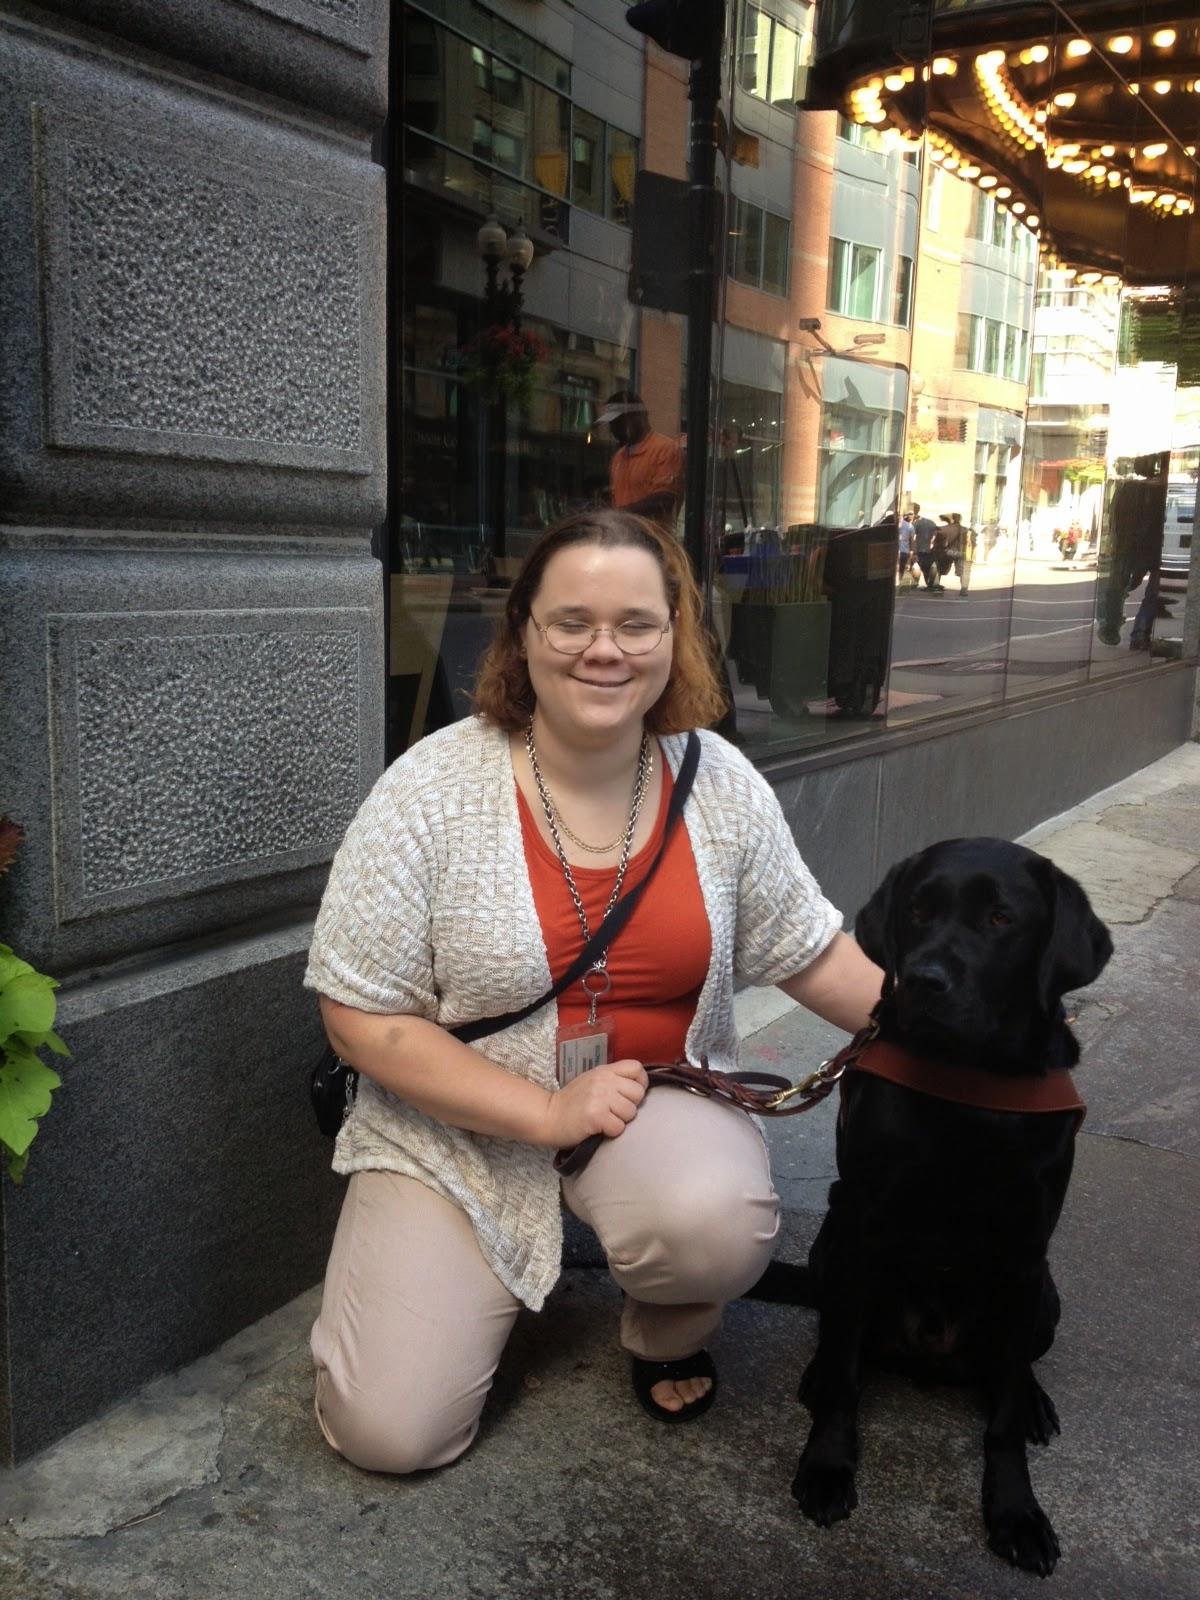 Katie Crocker and her black Lab Jetty